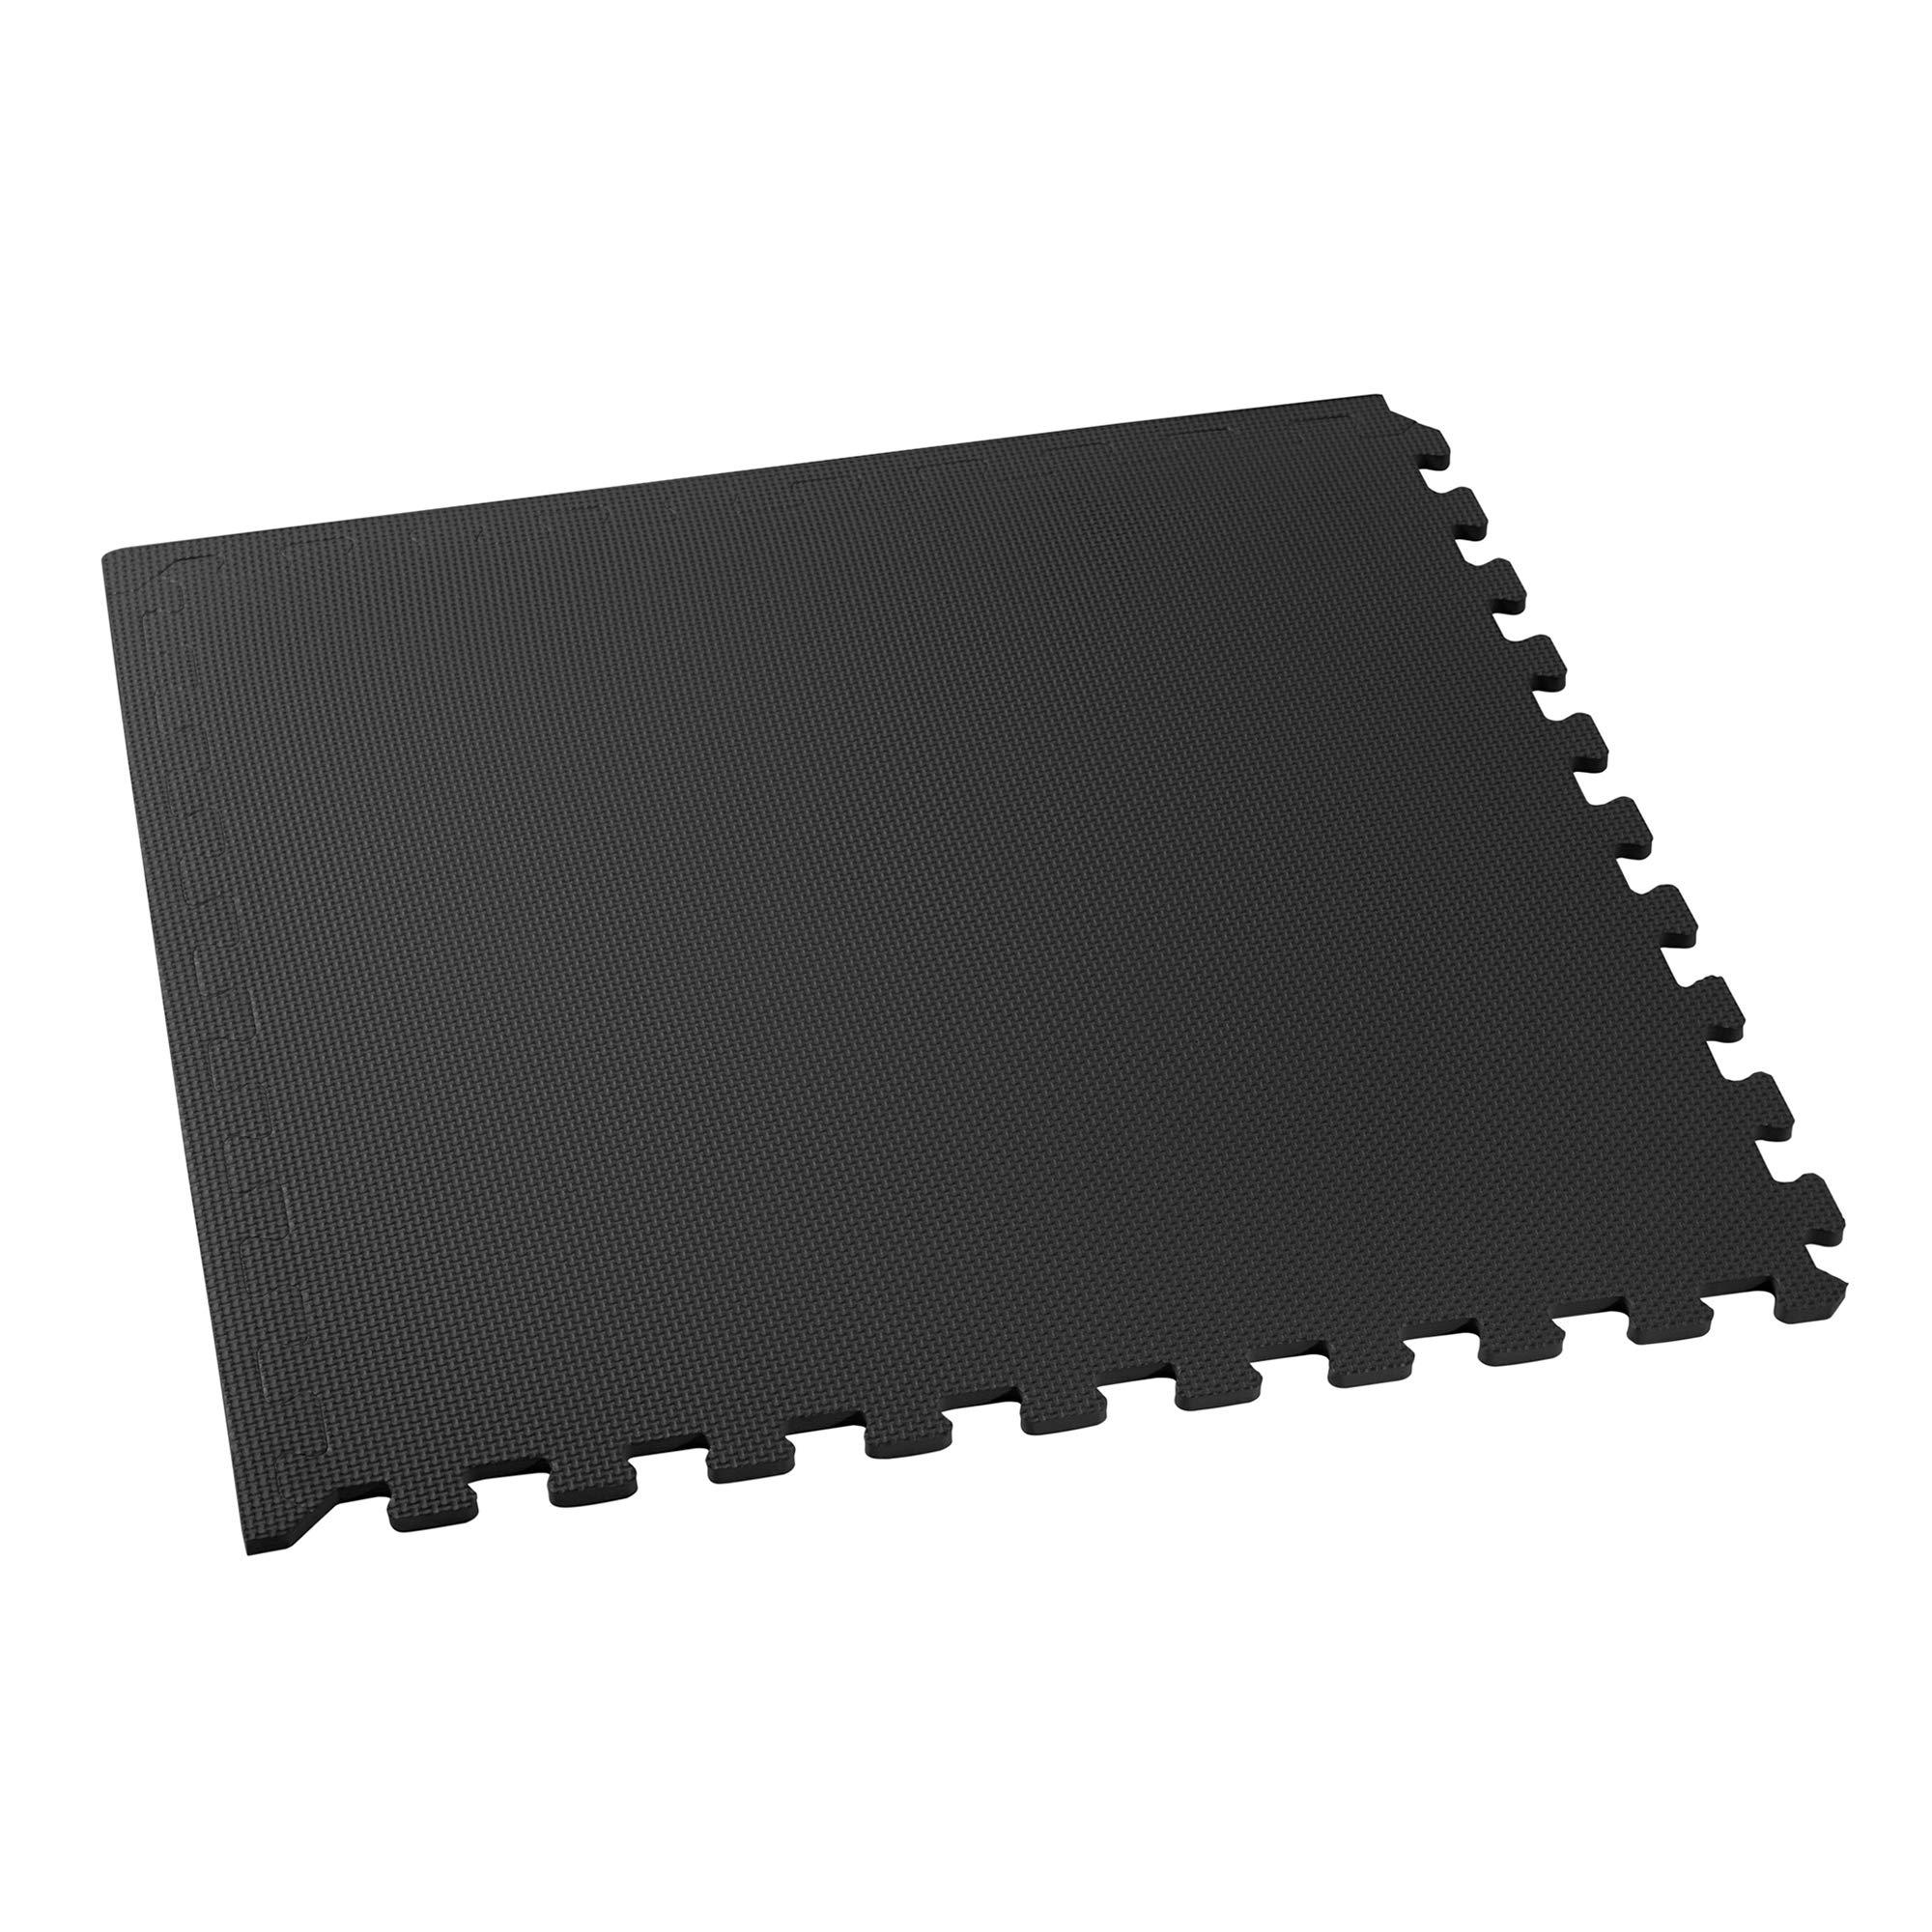 We Sell Mats Foam Interlocking Square Floor Tiles with Borders, (Each 2 x 2 Feet),   16 SQFT (4 Tiles + Borders) - Black